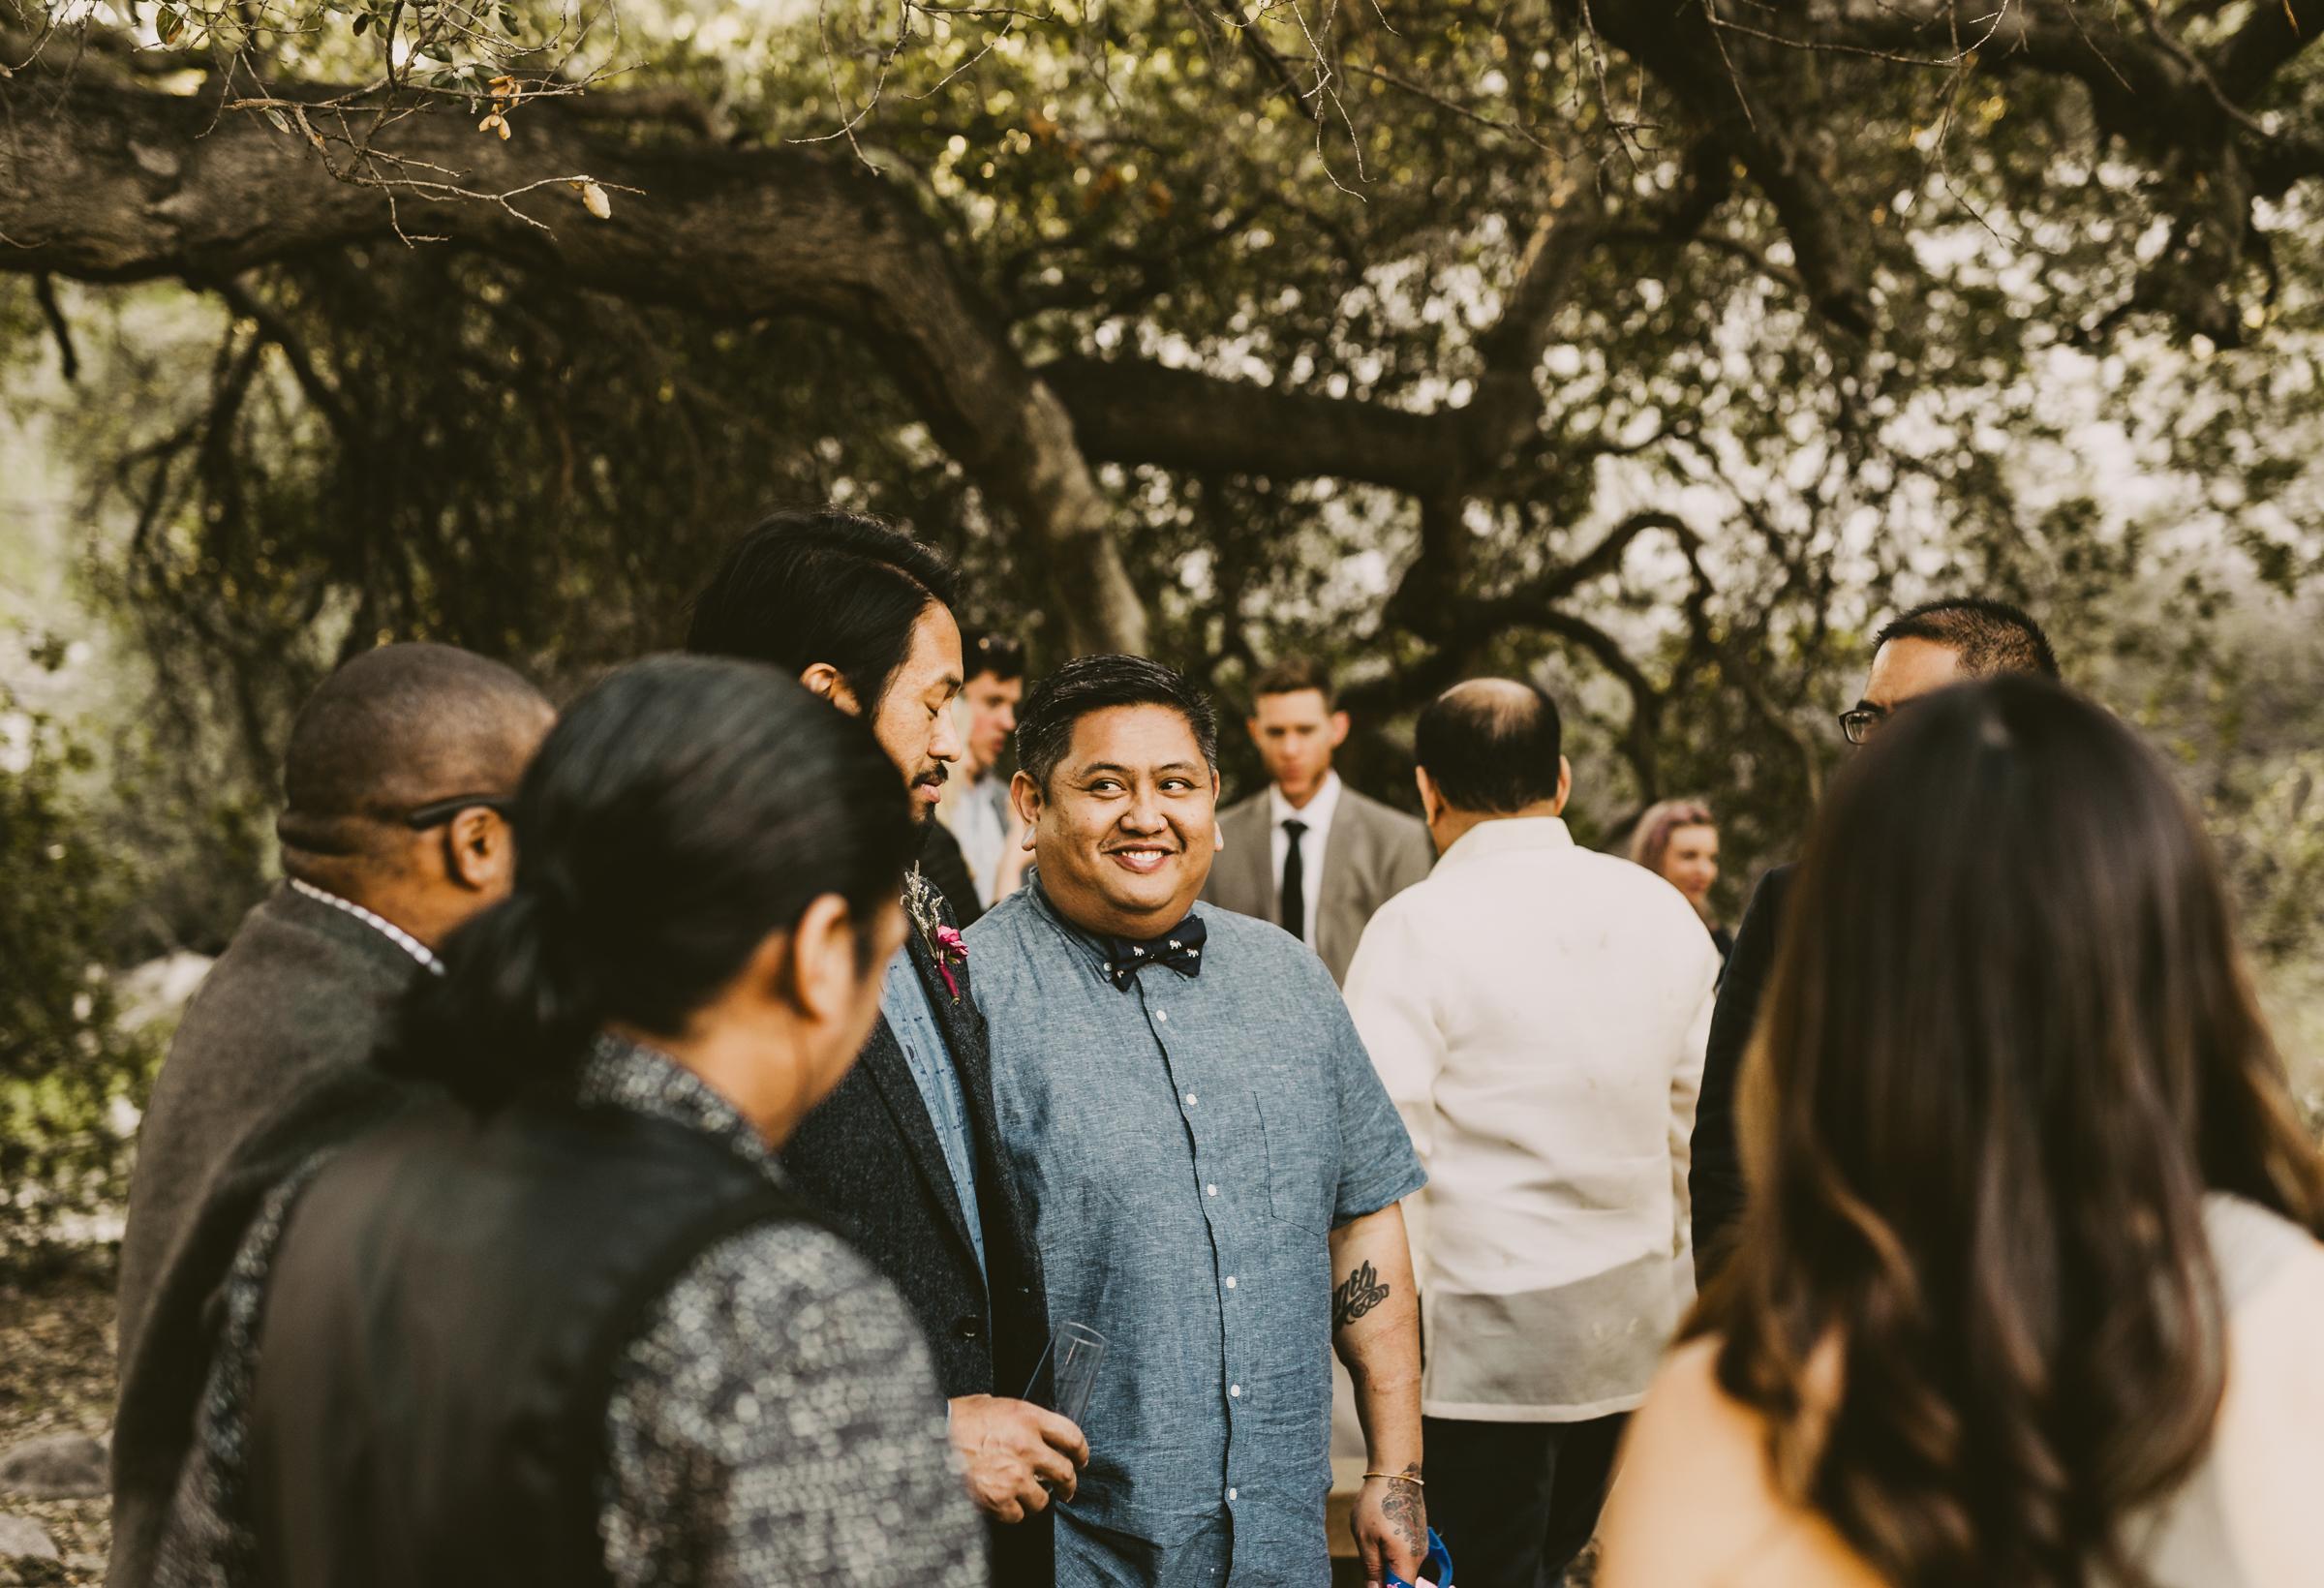 ©Isaiah + Taylor Photography - Intimate Elopement, Eaton Canyon, Los Angeles Wedding Photographer-51.jpg